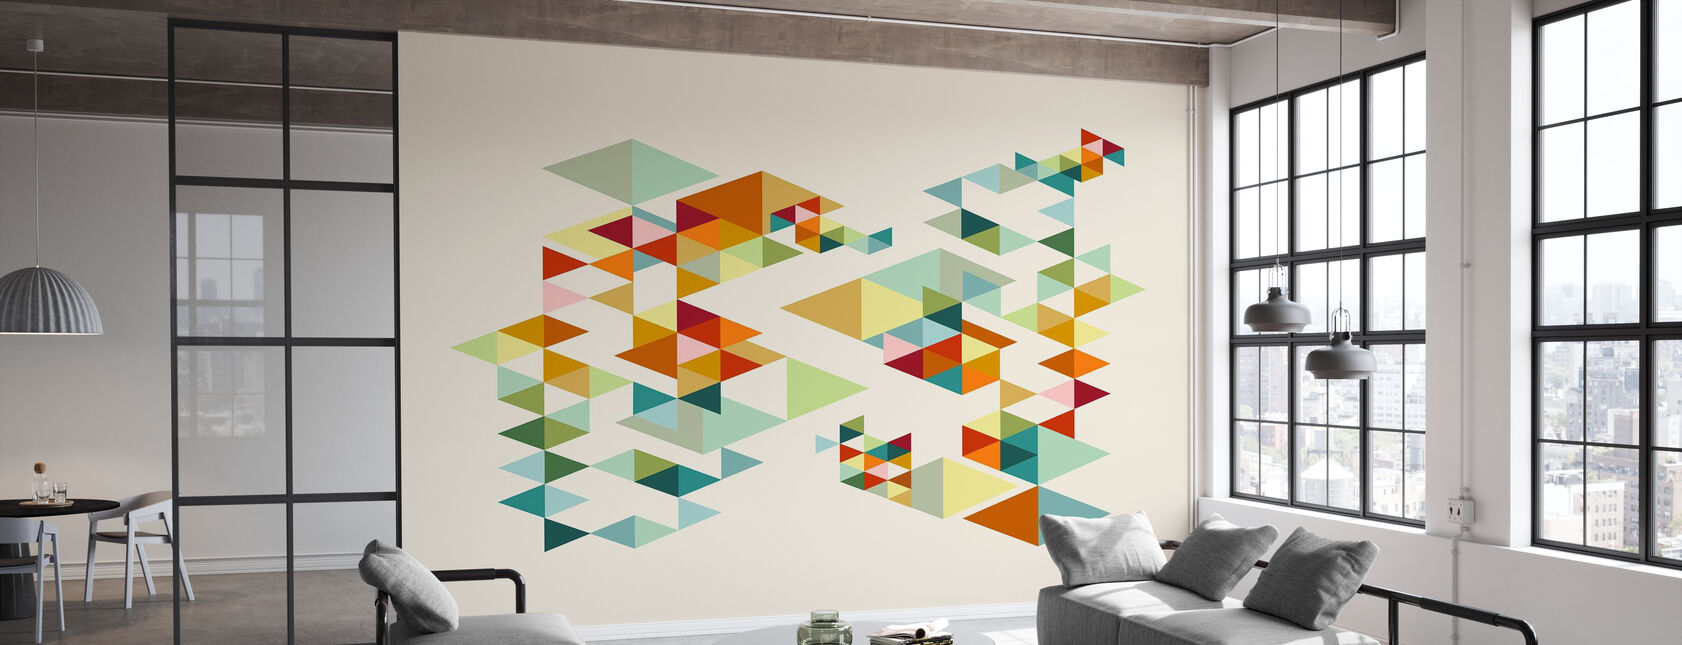 Retrospectra - Wallpaper - Office